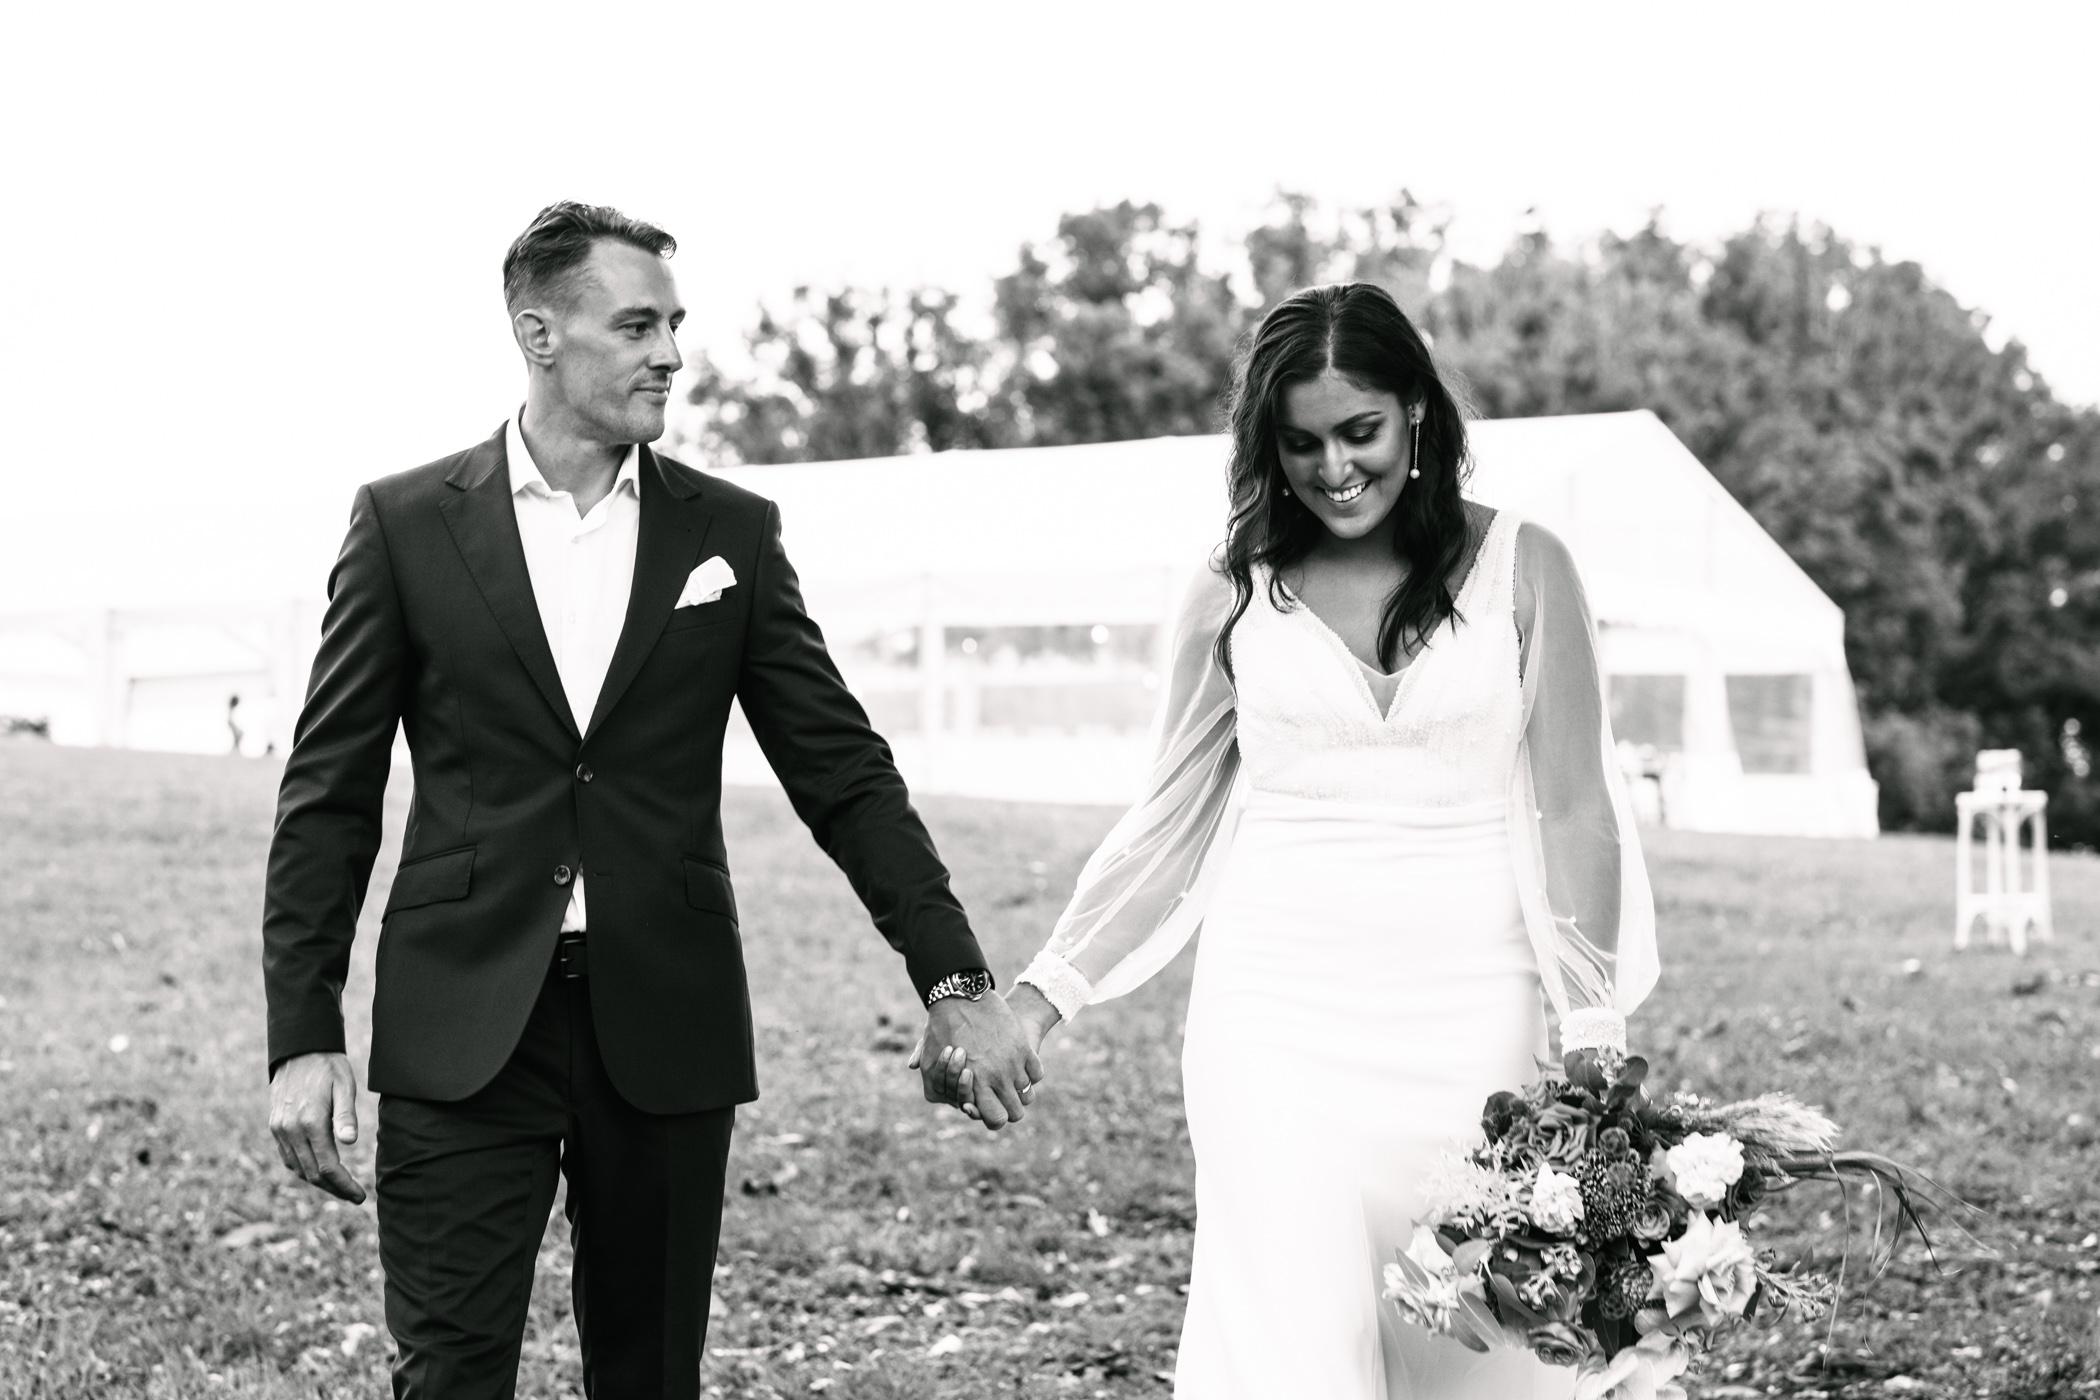 S&S-Bridal Portraits-72.jpg